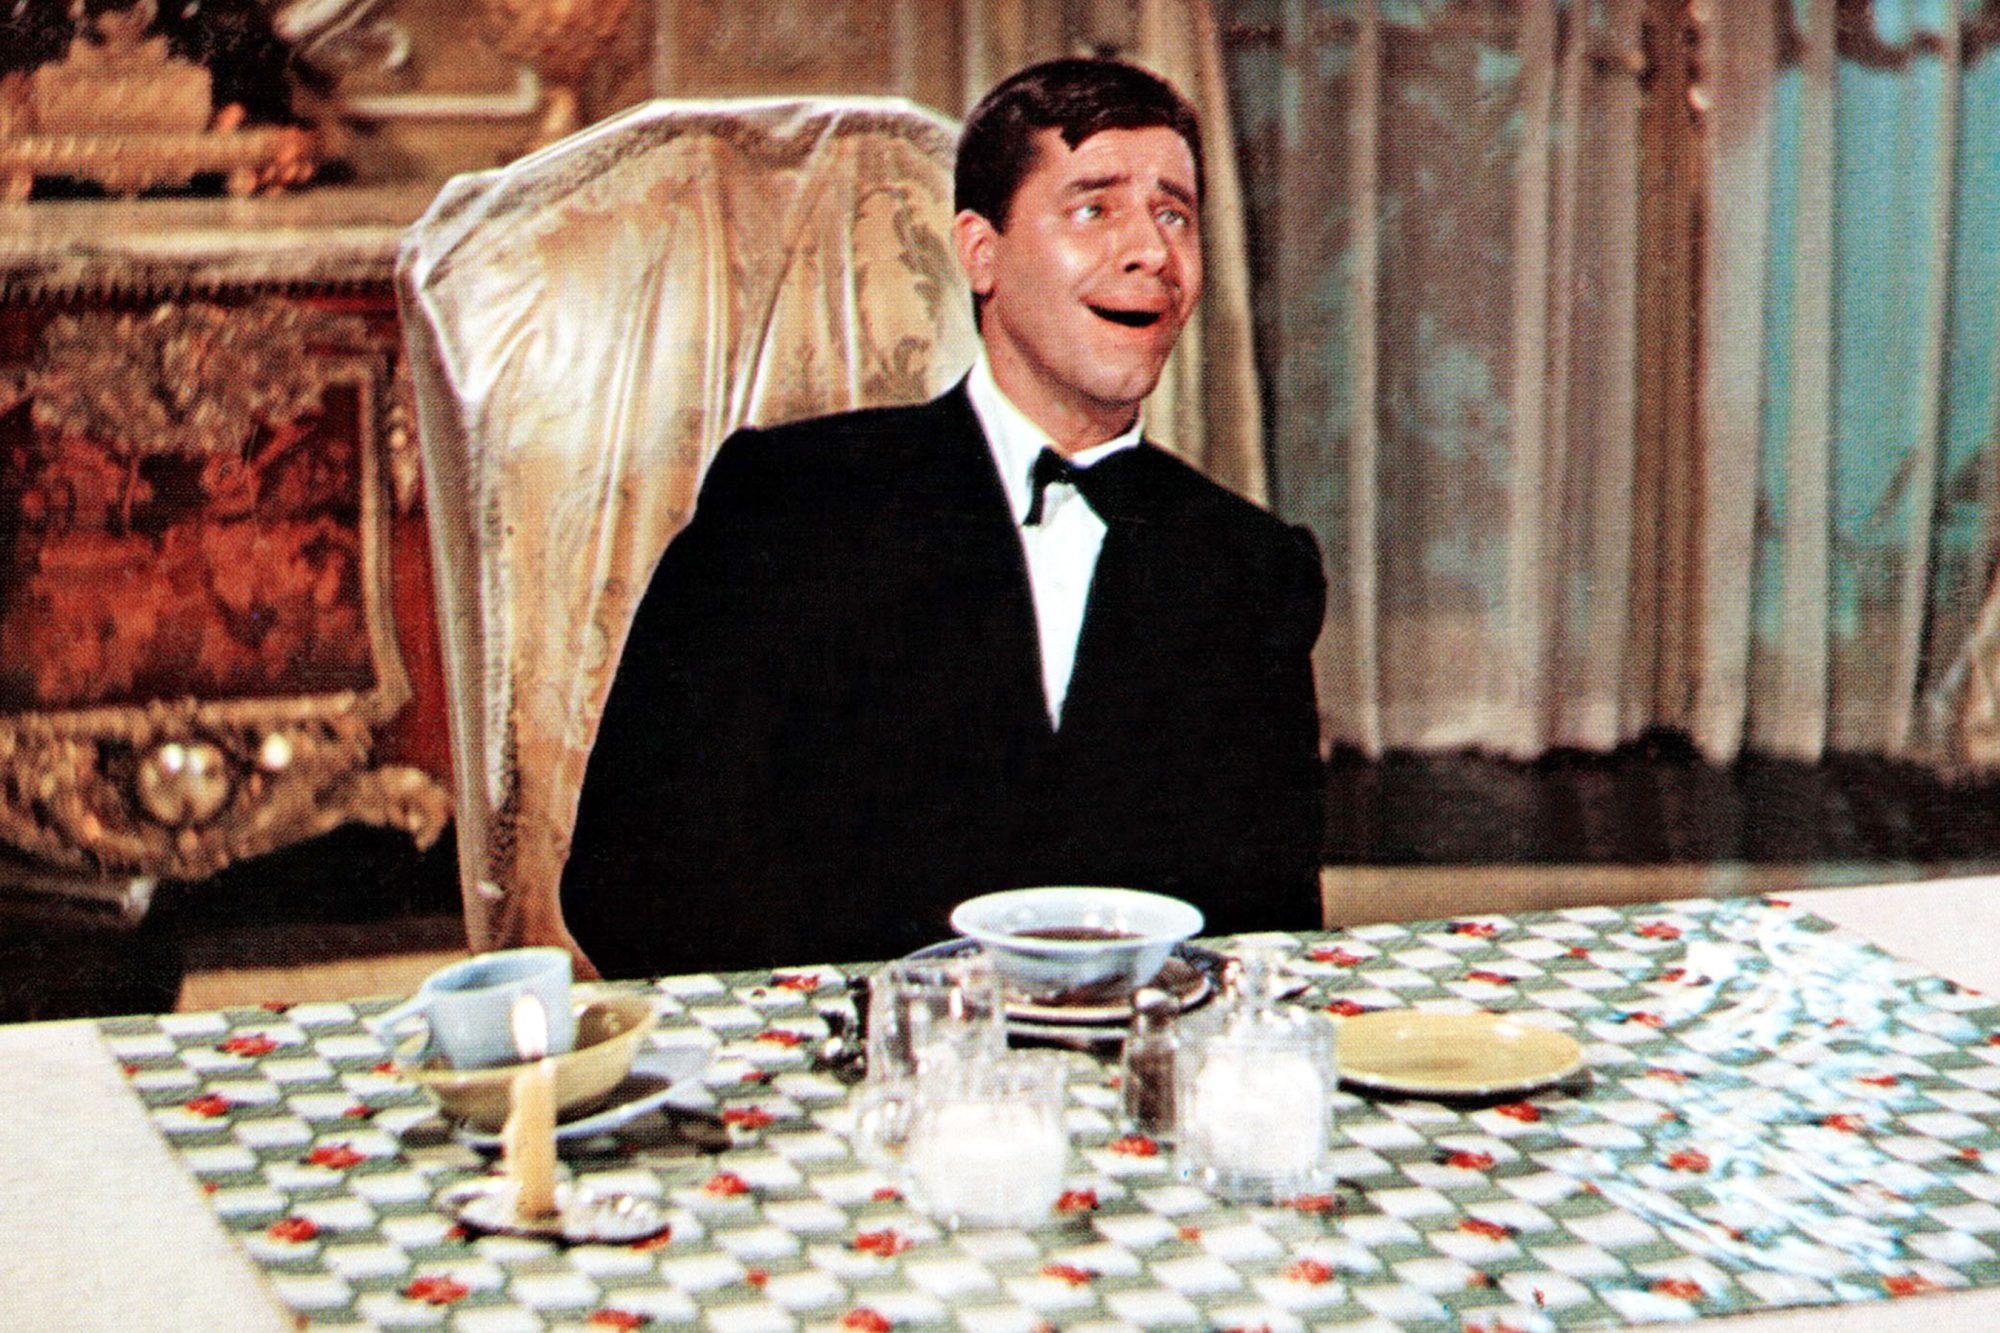 CINDERFELLA, Jerry Lewis, 1960